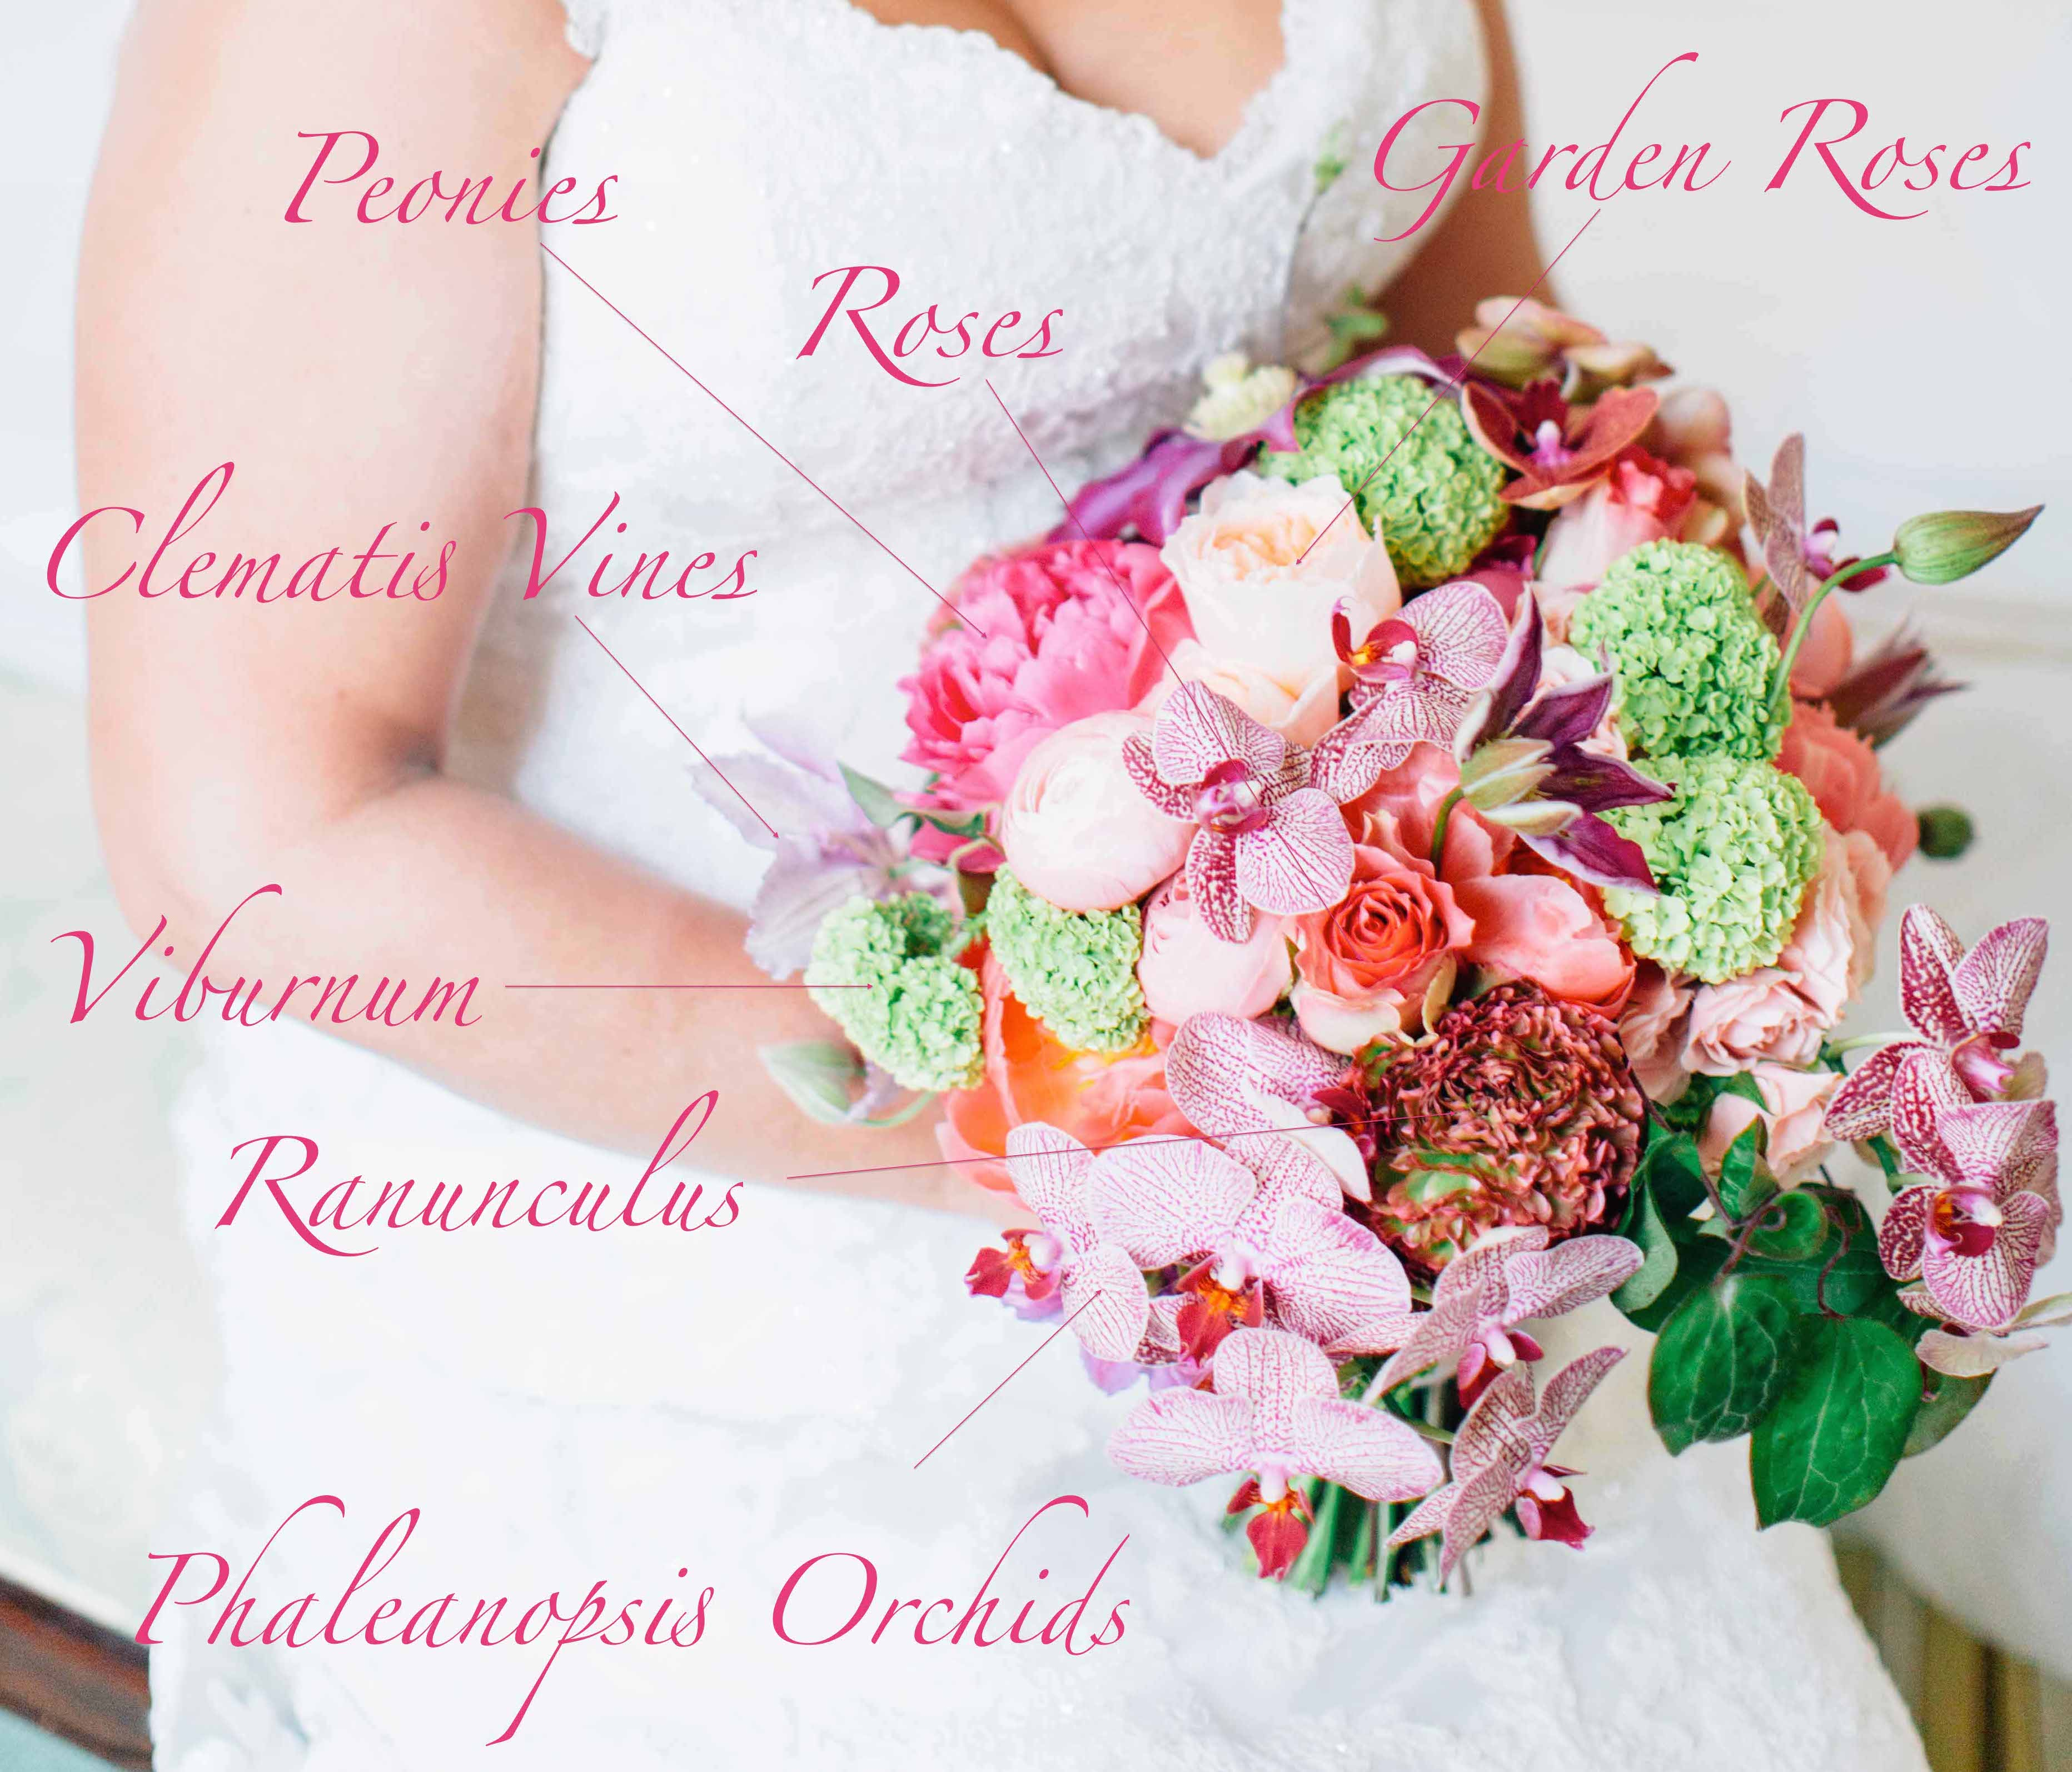 Bridal bouquet flowers with recipe of pink roses, orchids, ranunculus, viburnum